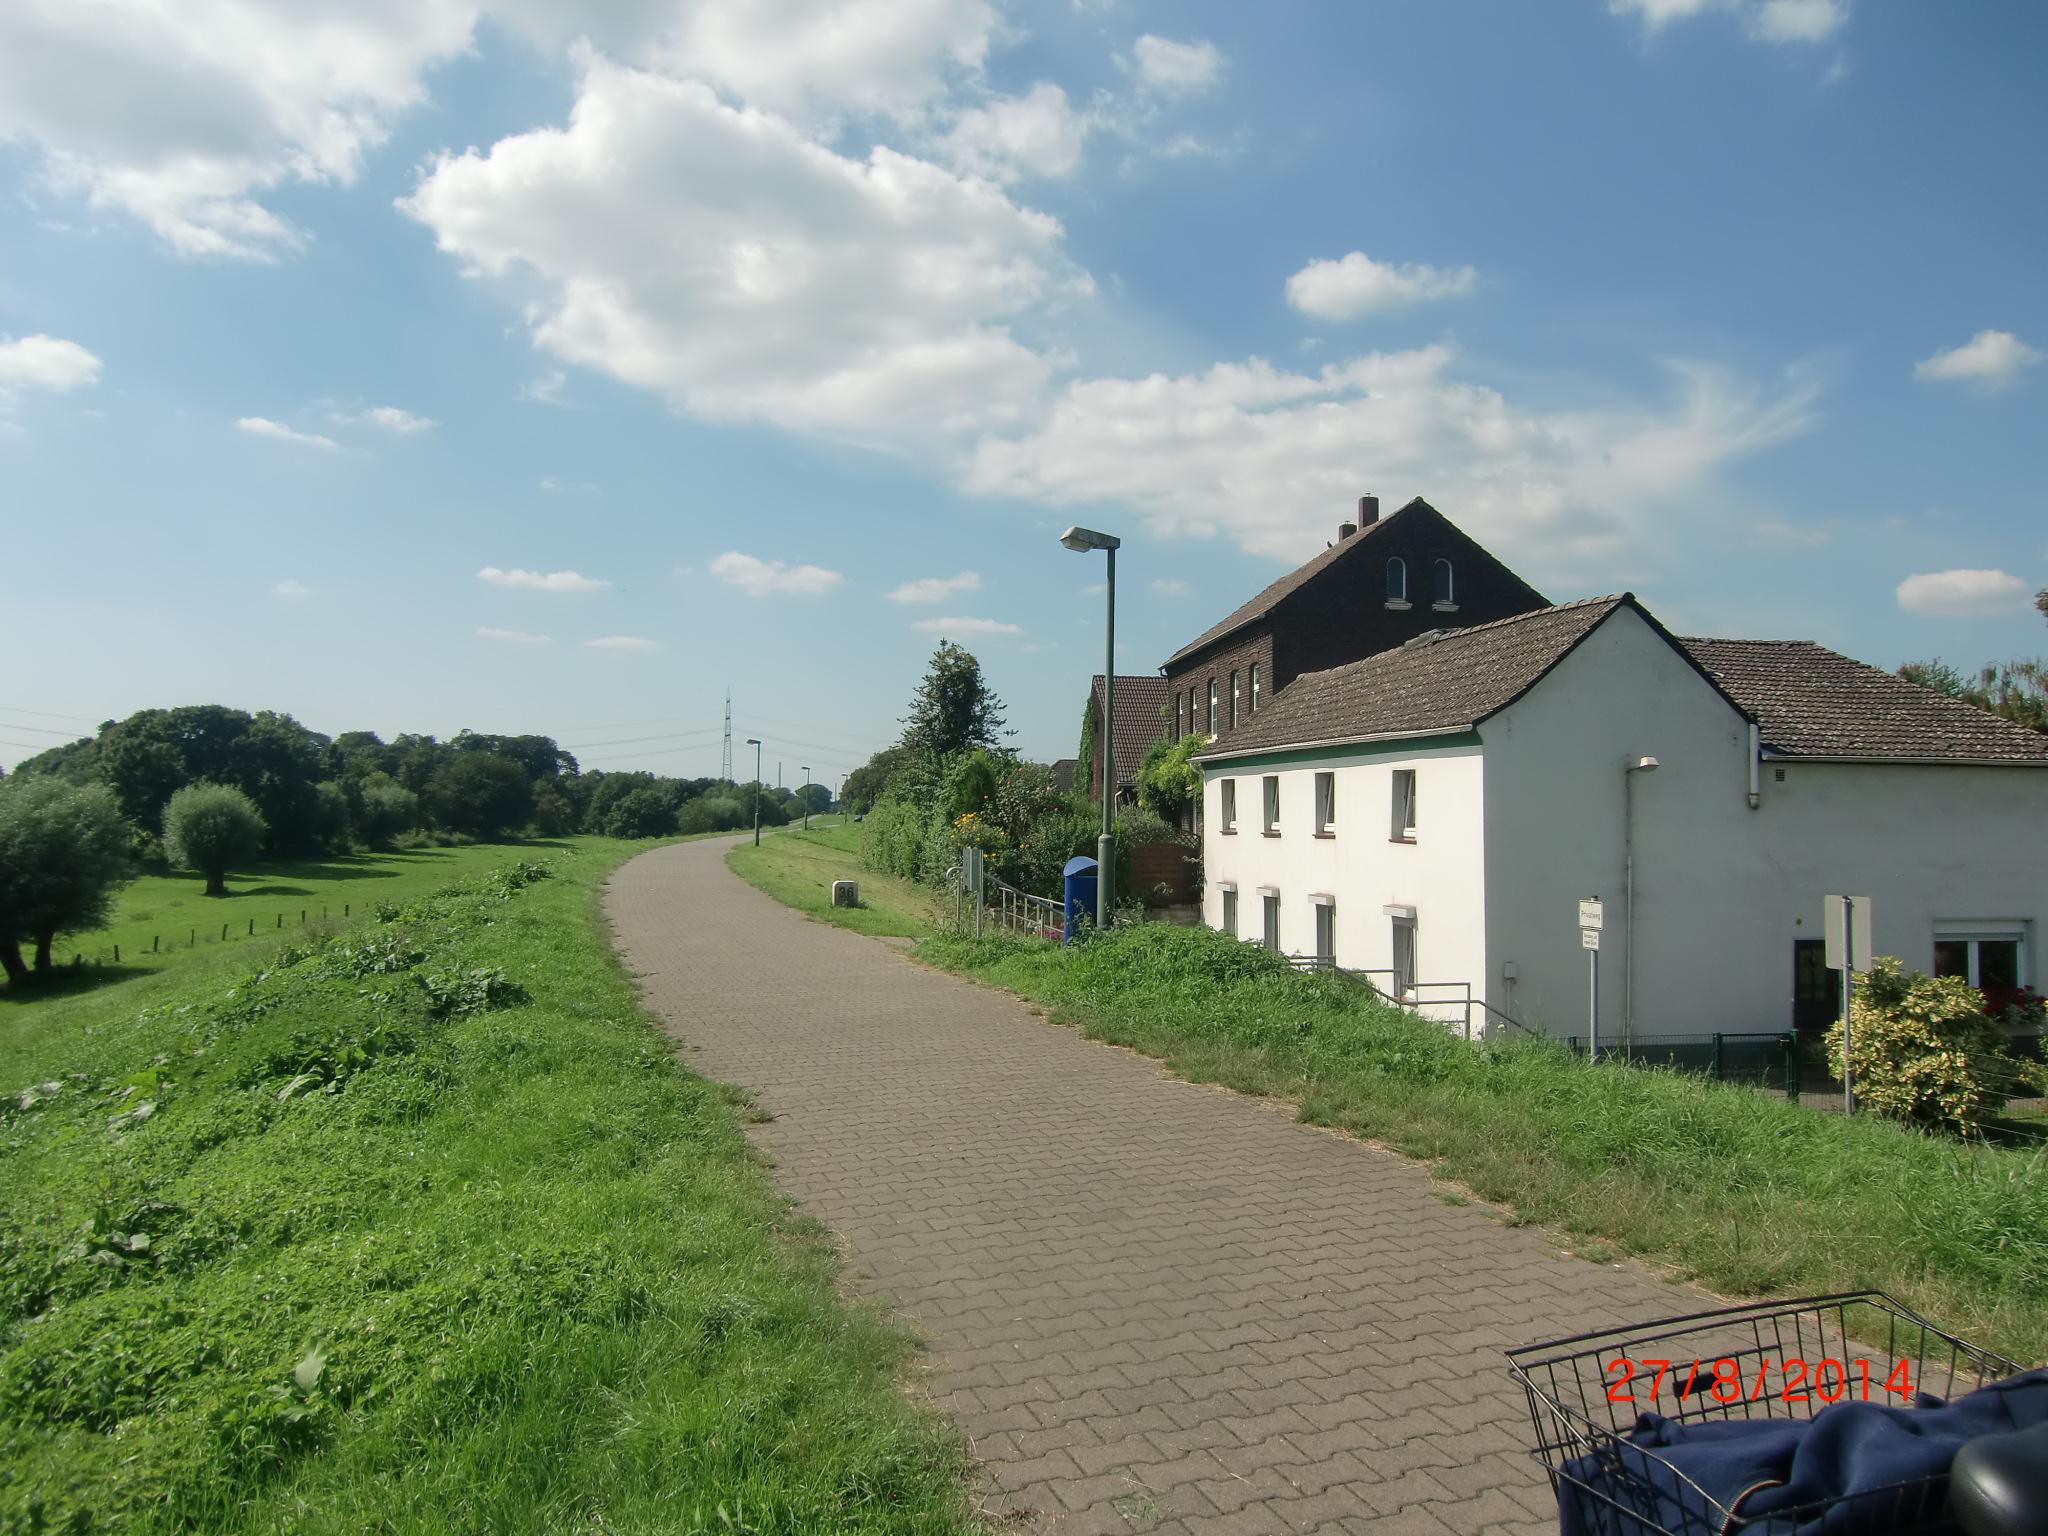 CIMG0290 Dorf Friemersheim